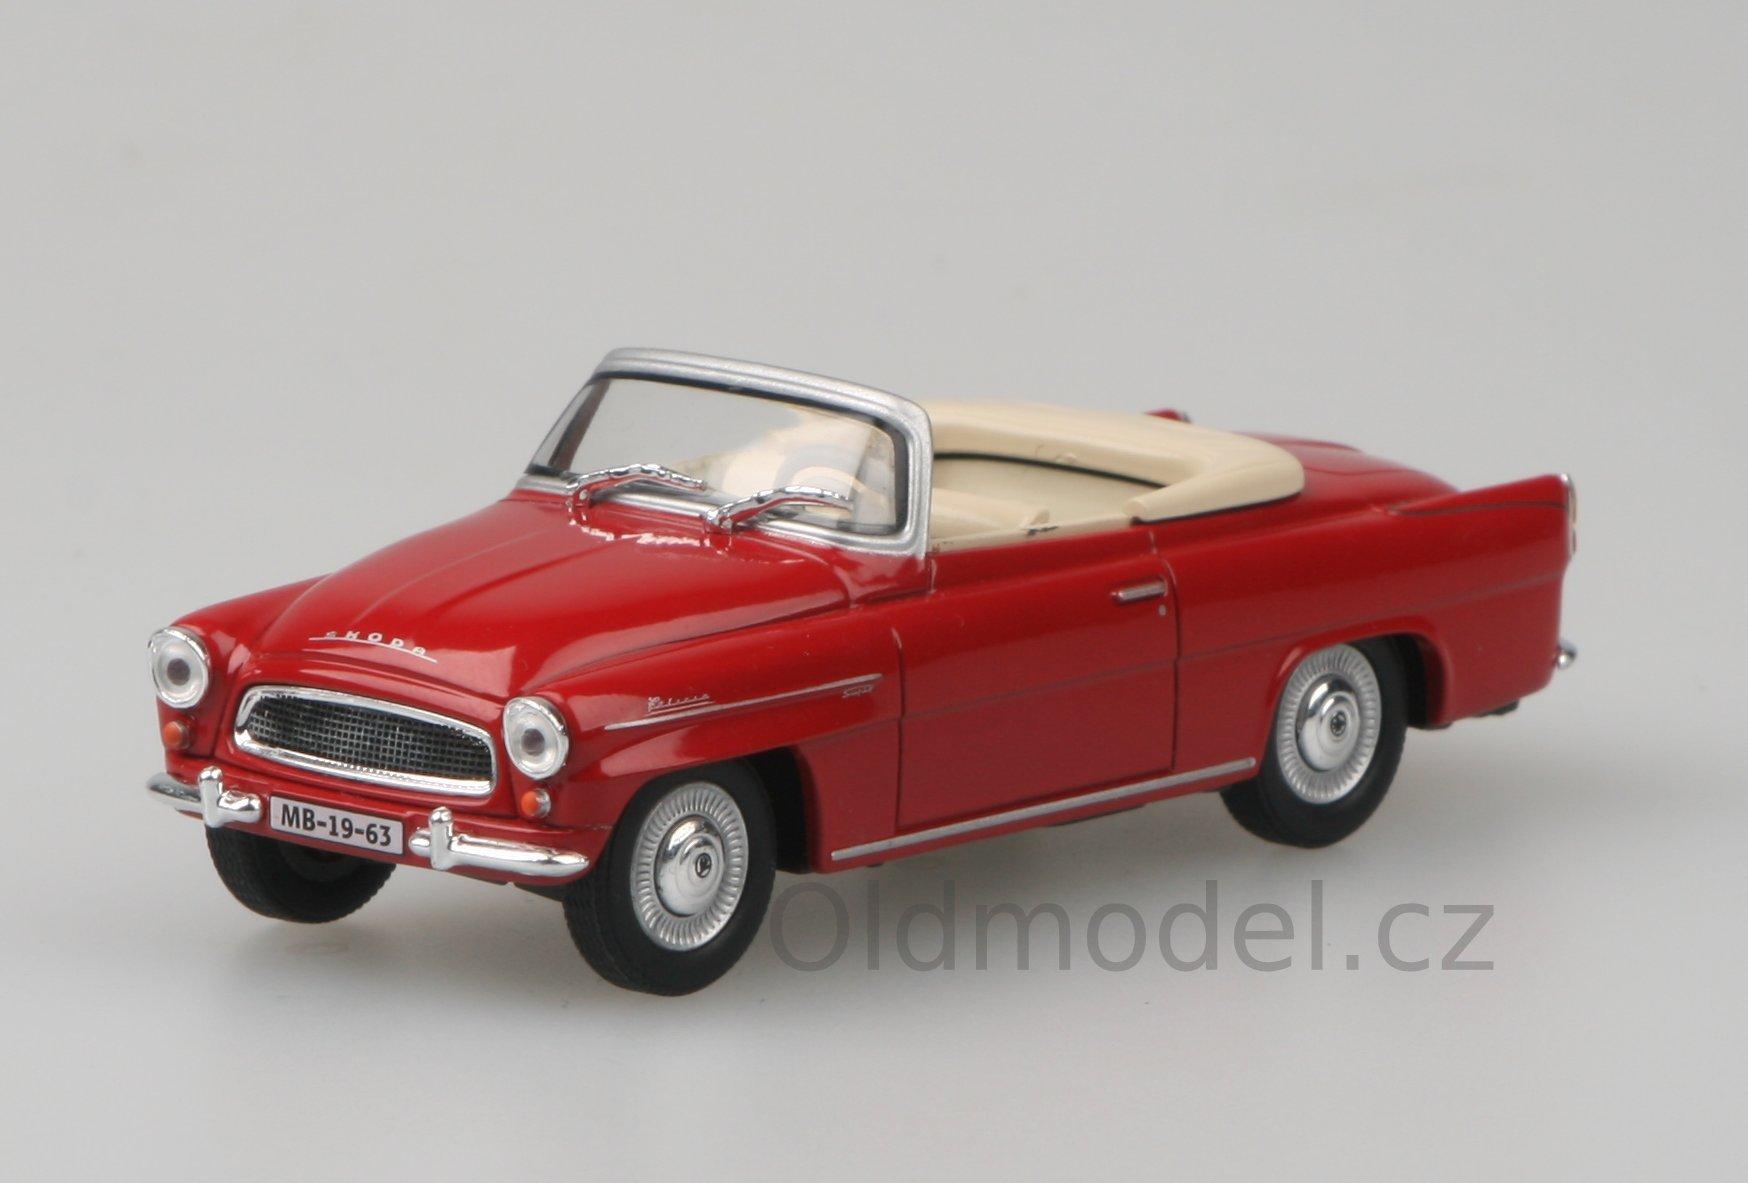 Model autíčka Felicia 63